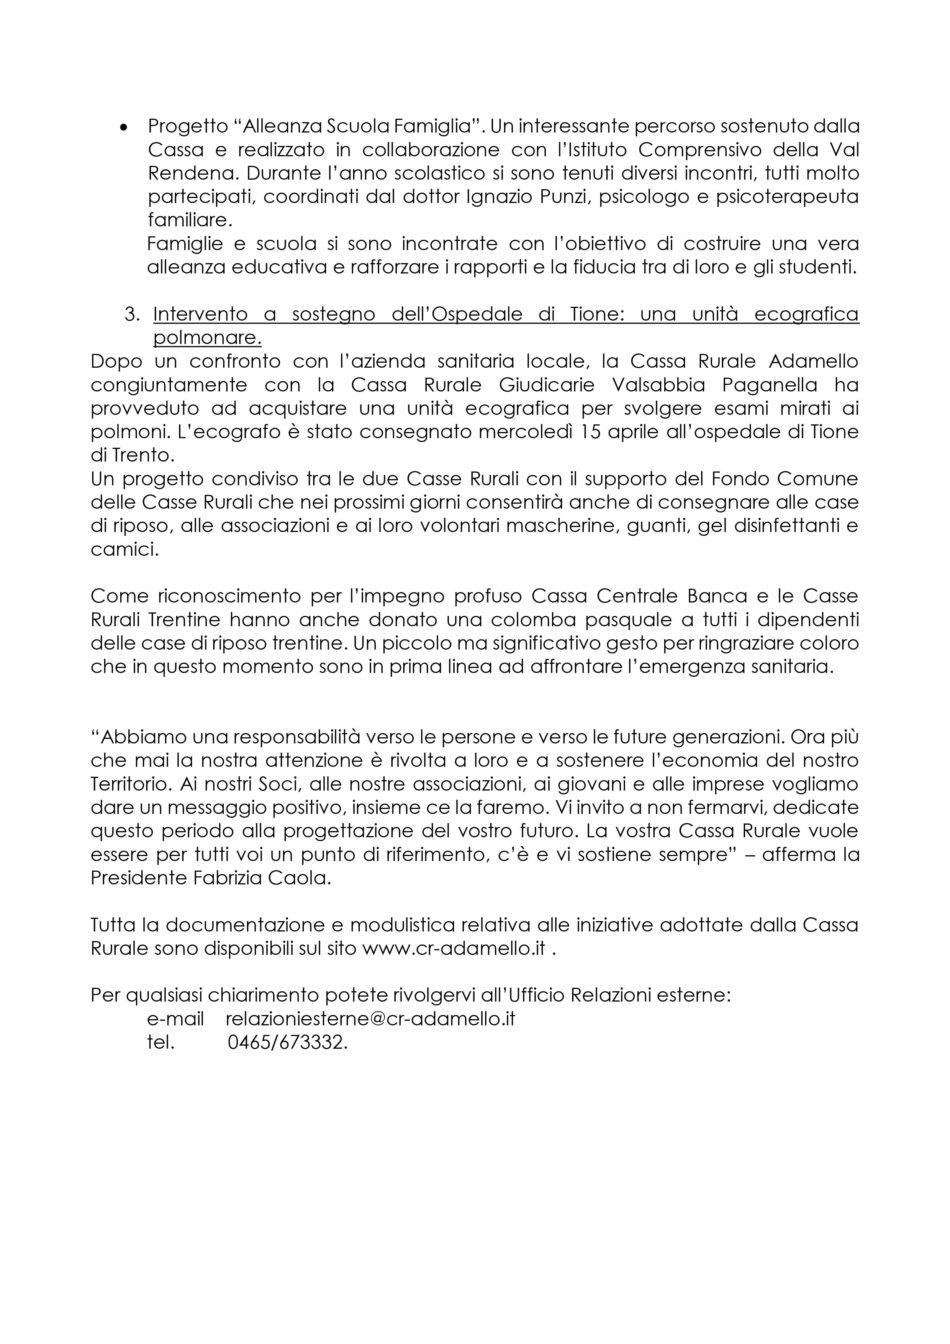 Cassa Rurale Adamello